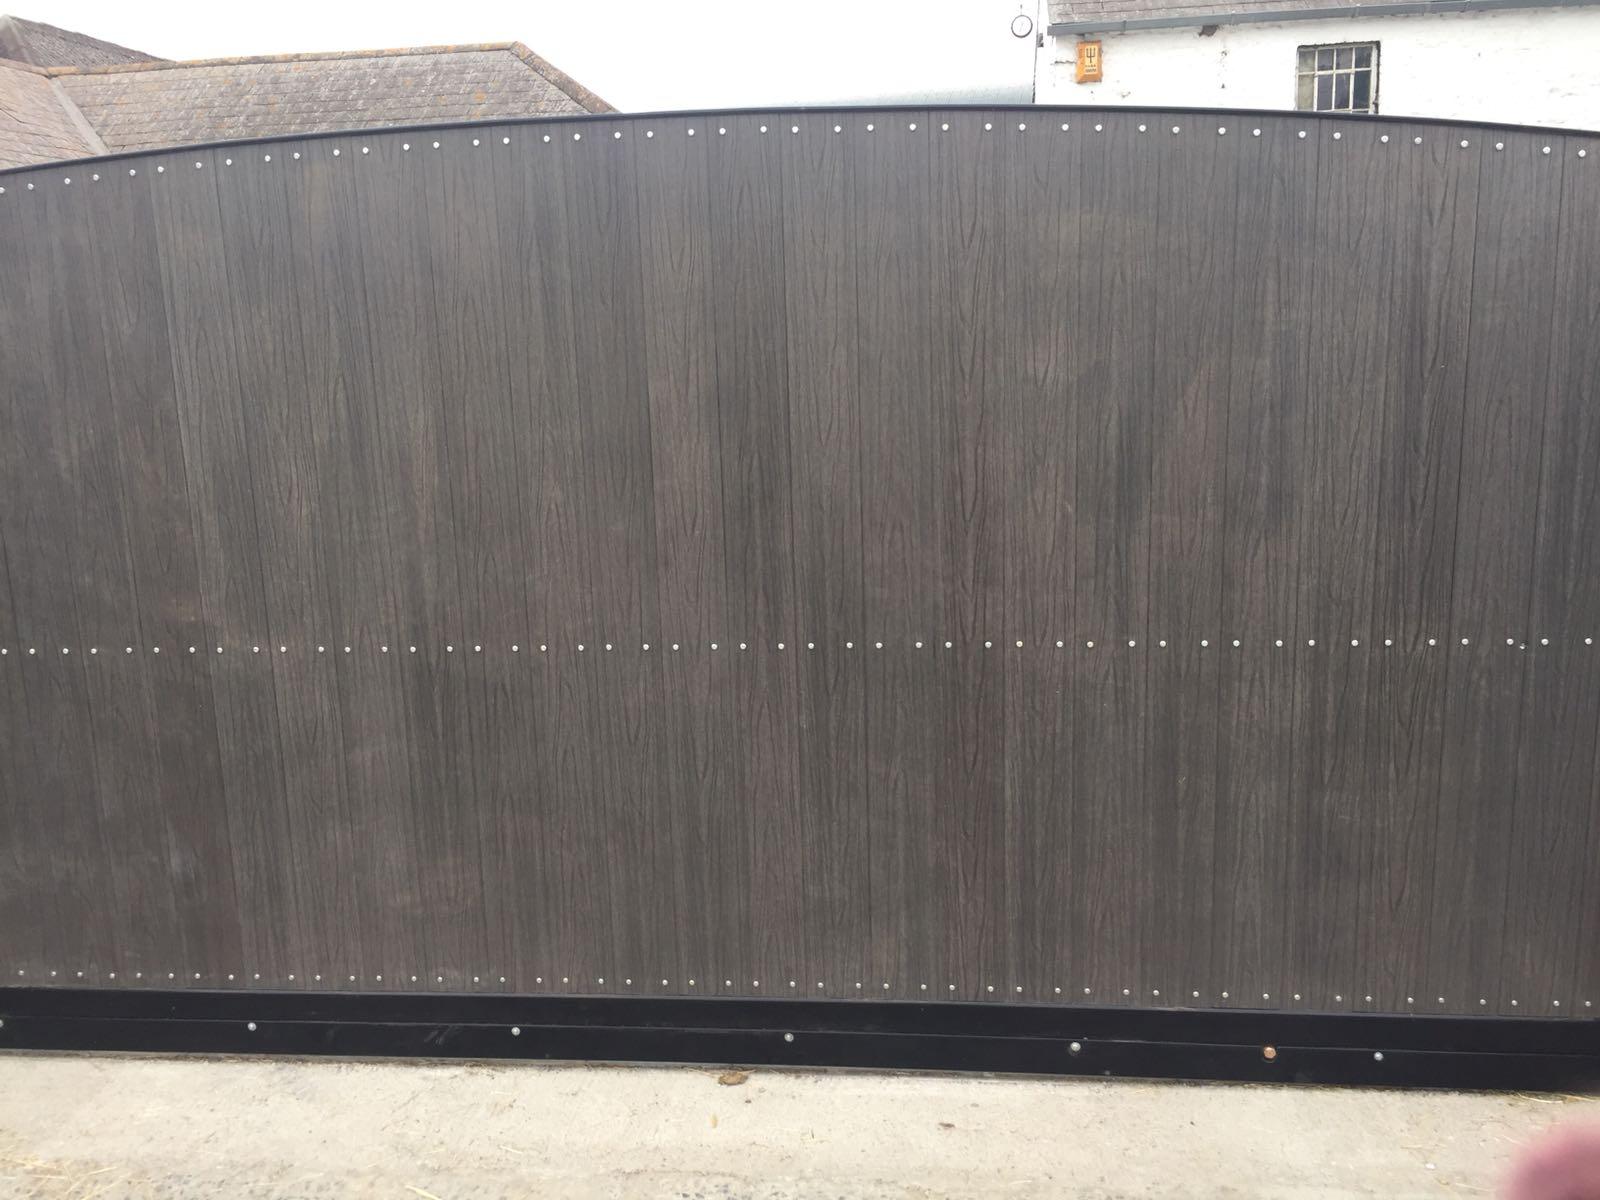 Irish Fencing Composite Fences And Gates Slider Gate 2